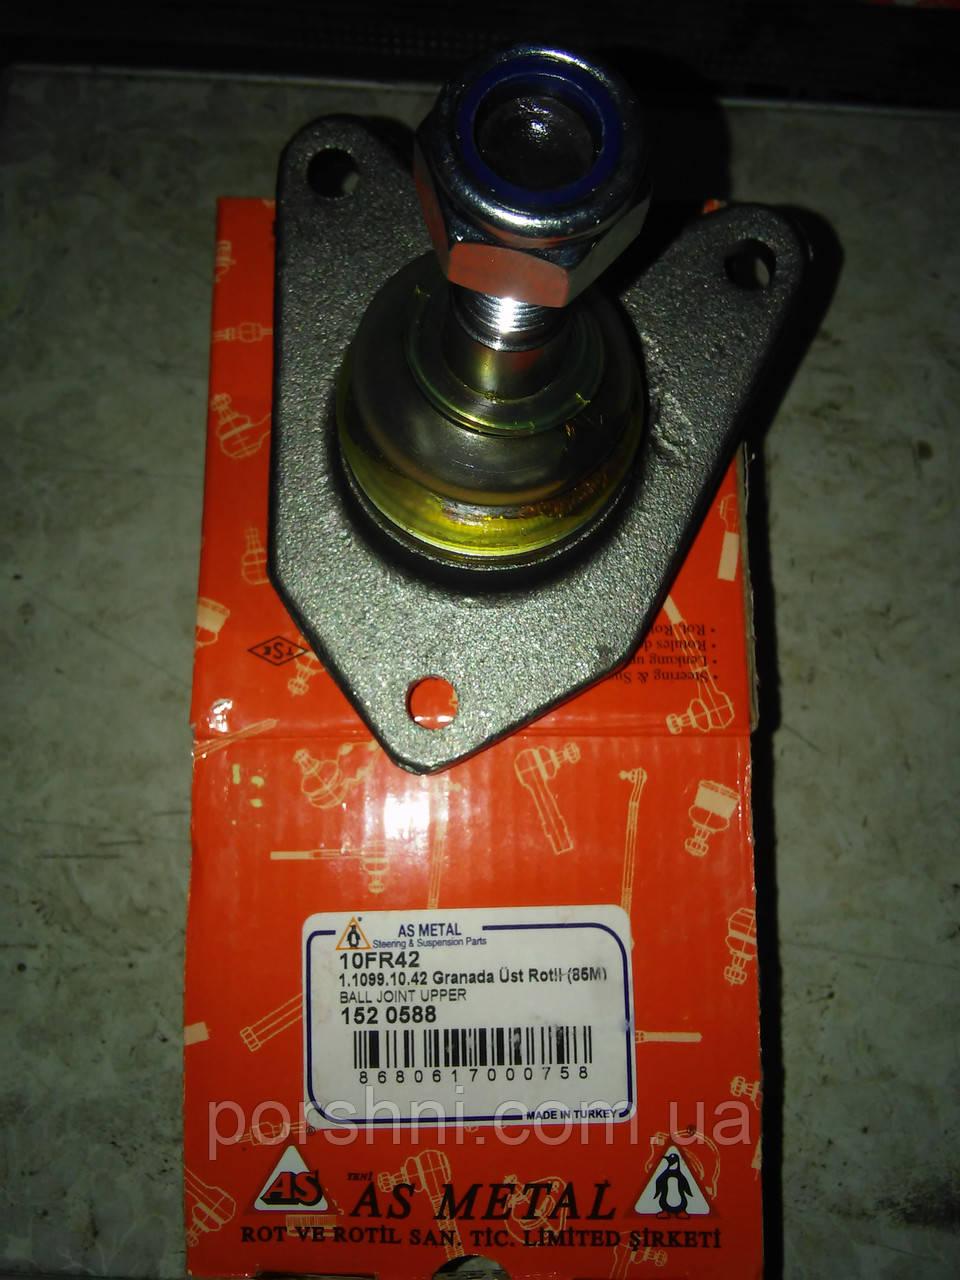 Кульова Ford Granada А/S METAL 1.1099.10.42 / 10FR42 ( верх )